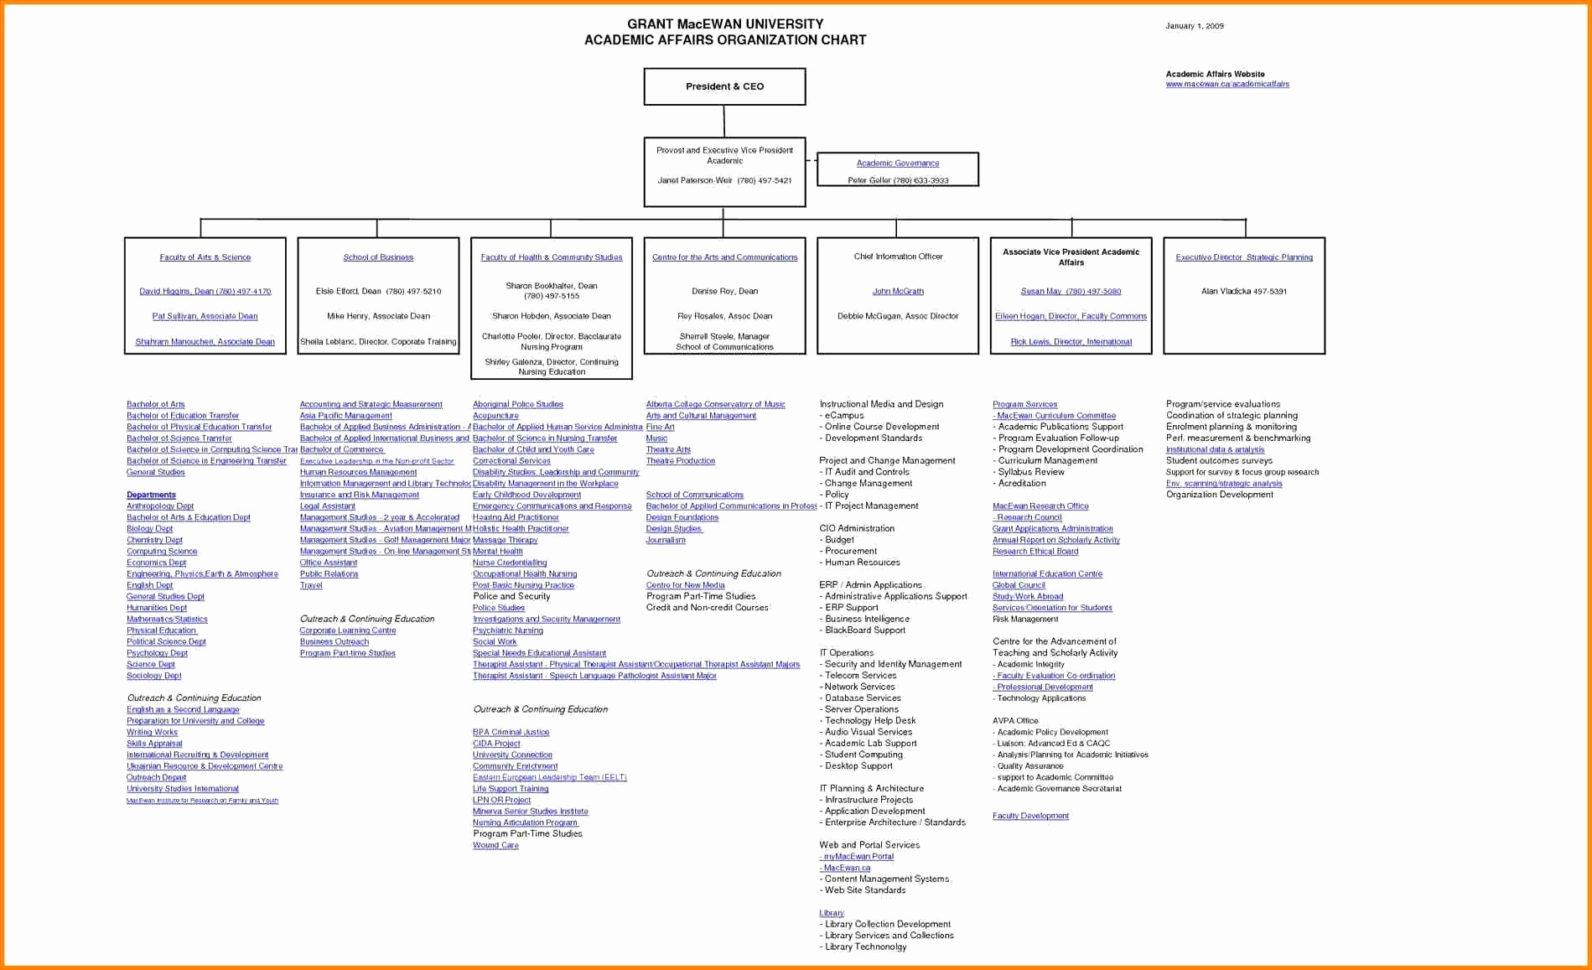 Gantt Chart Template Google Docs Elegant Timeline Chart Google And Gantt Chart Template Google Docs